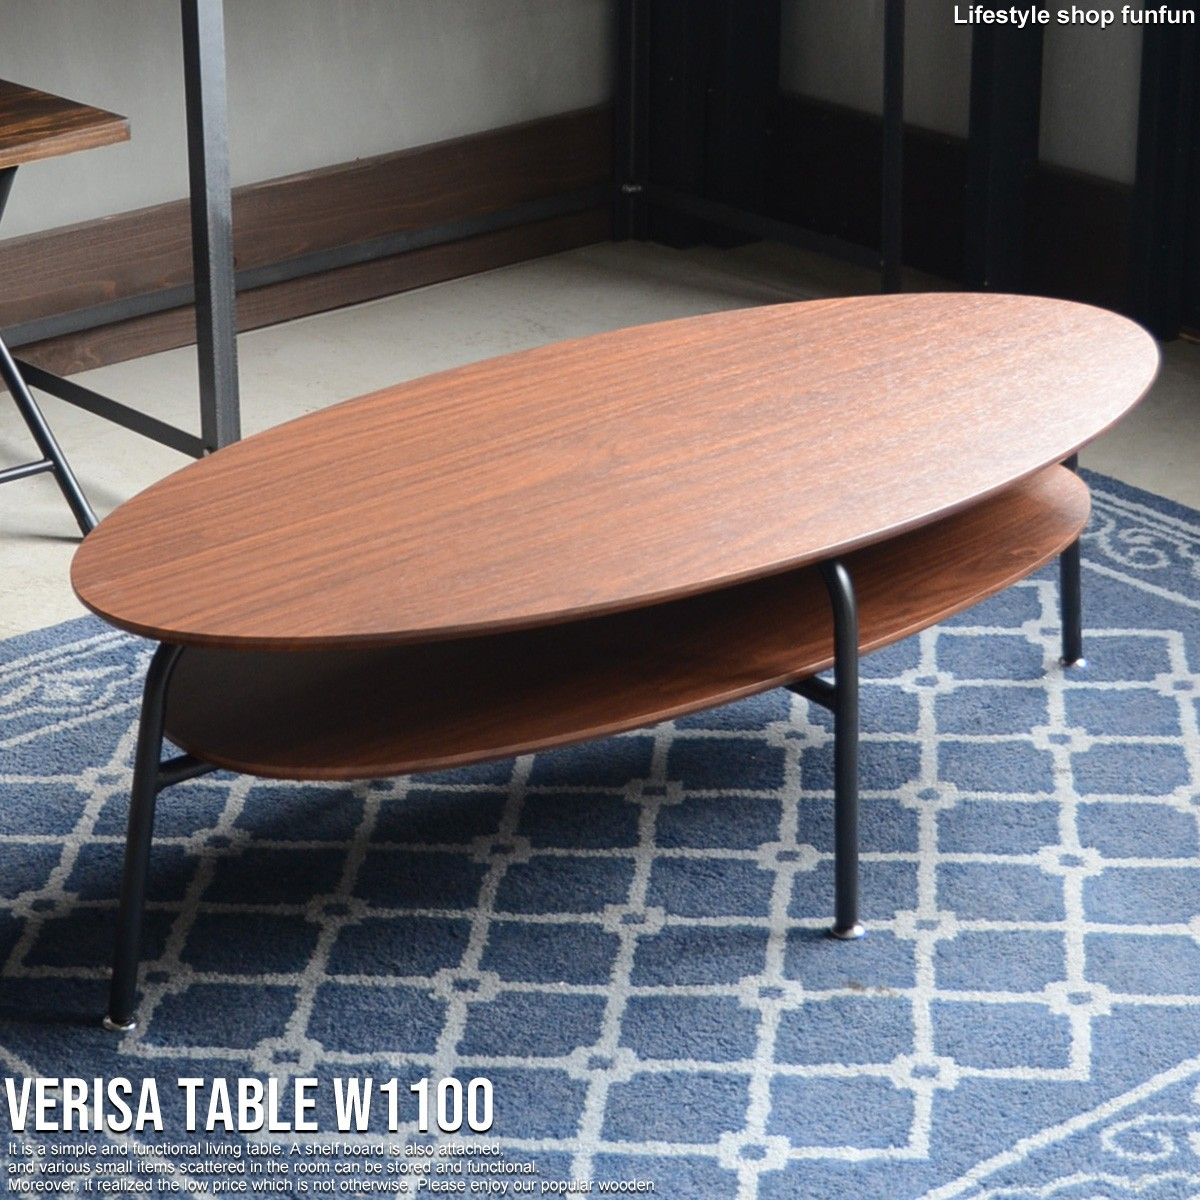 VERISAセンターテーブル幅110